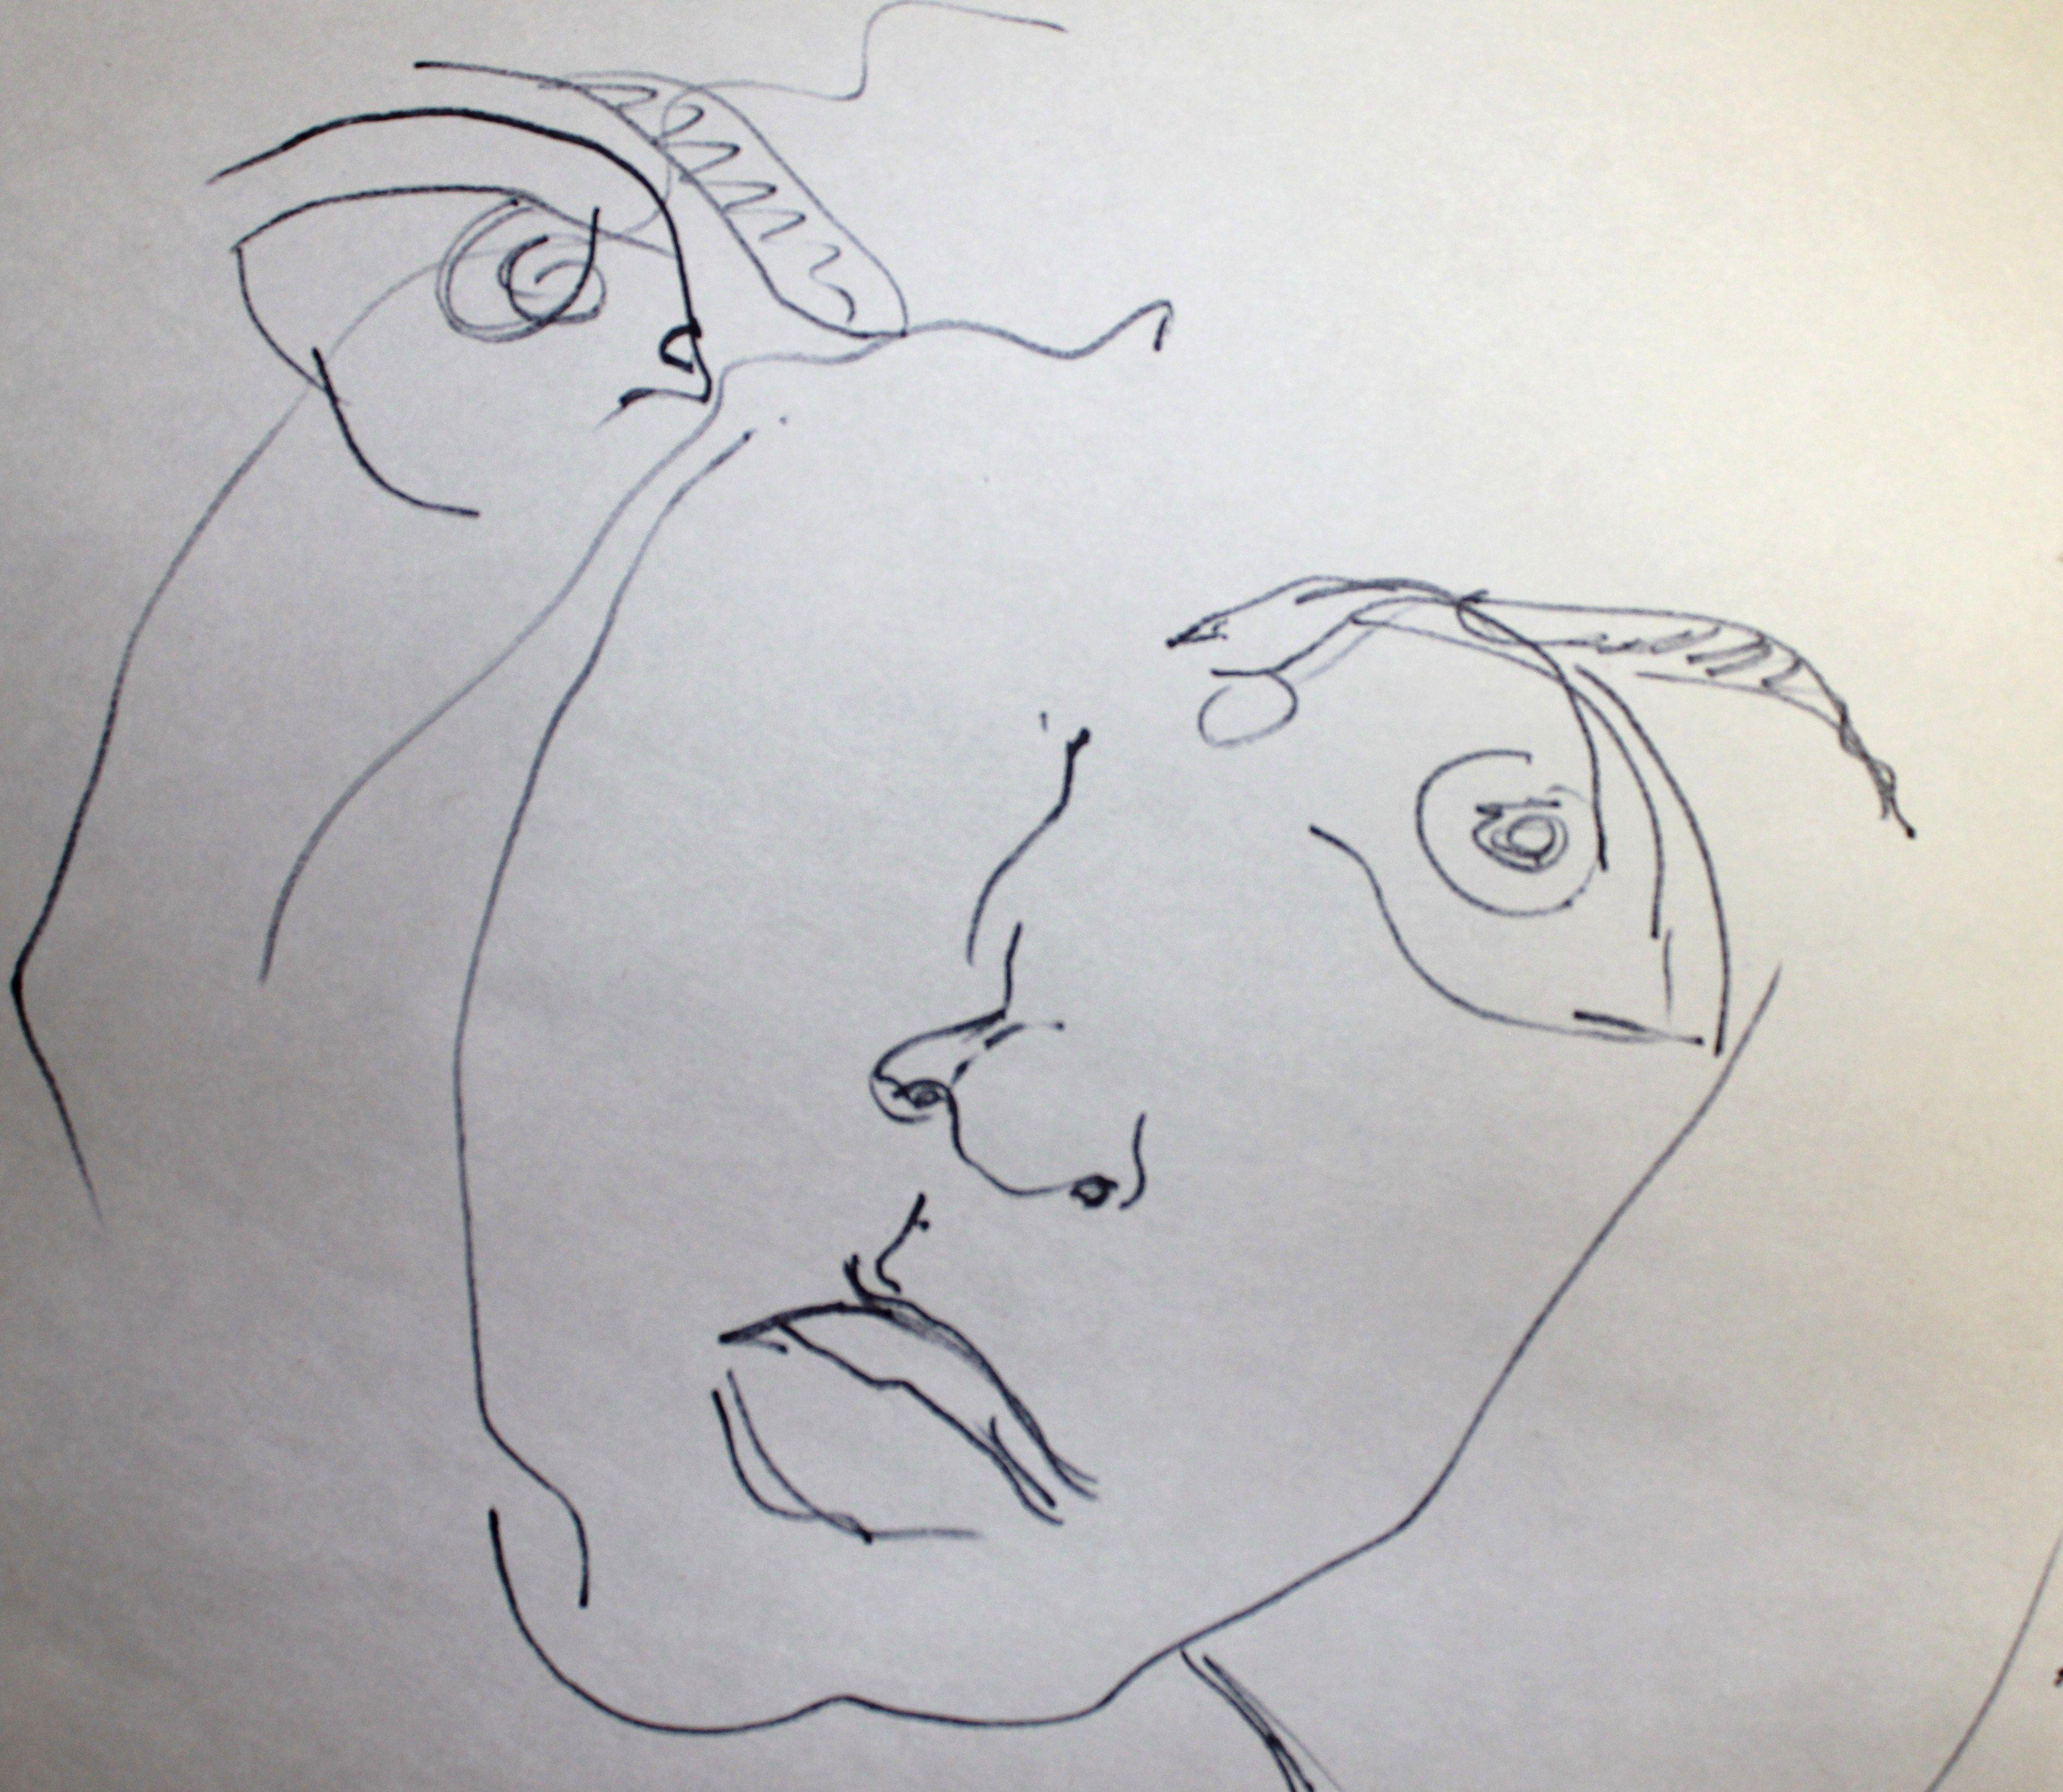 Blind Contour Line Drawing Self Portrait : Blind contour drawing self portraits pinterest